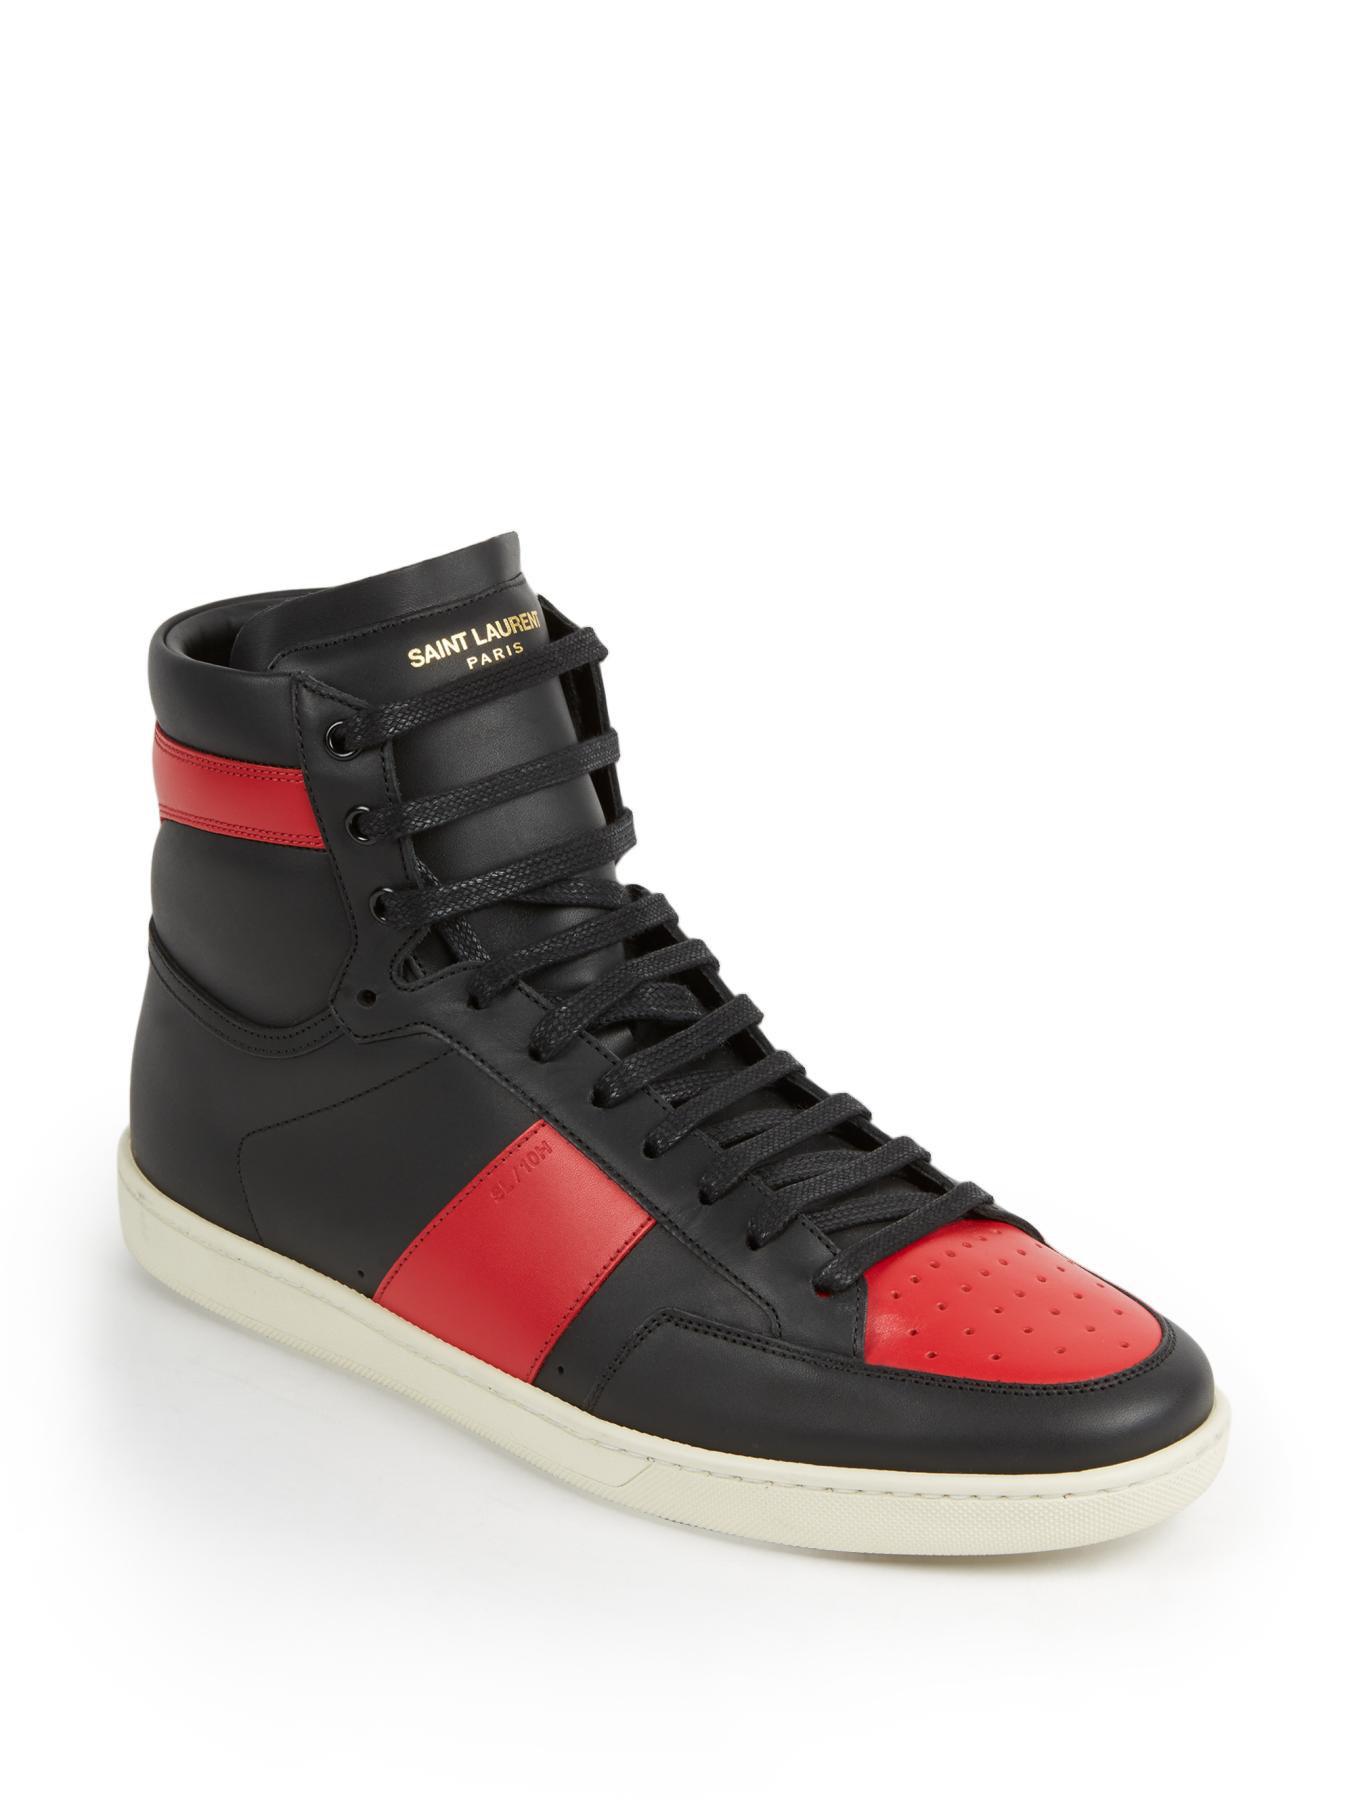 saint laurent colorblocked leather high top sneakers in black for men black red lyst. Black Bedroom Furniture Sets. Home Design Ideas